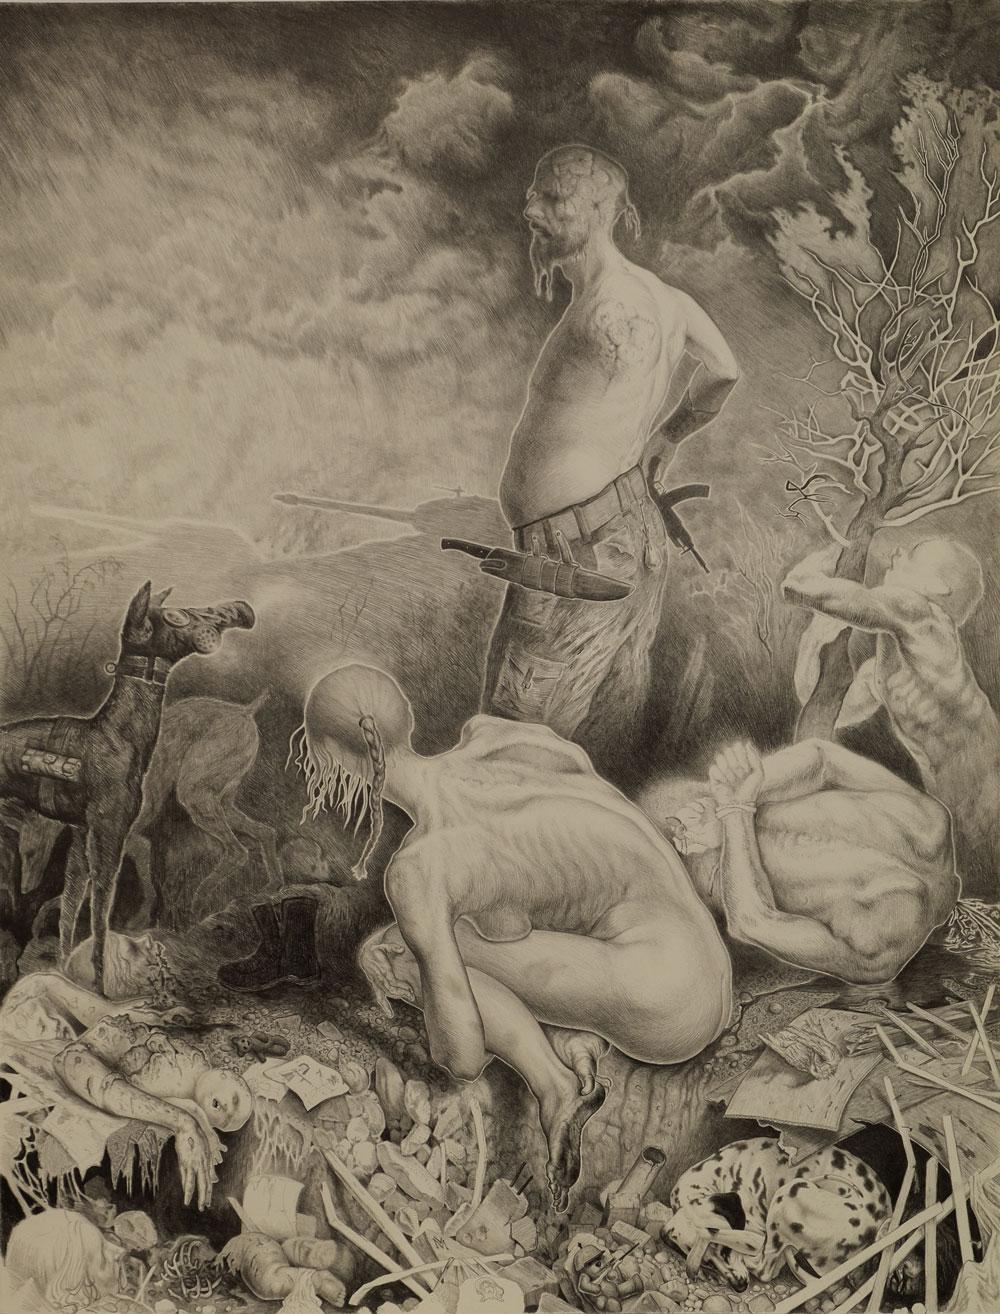 """Front"", Bleistift auf Büttenpapier, 72x56, 2016"